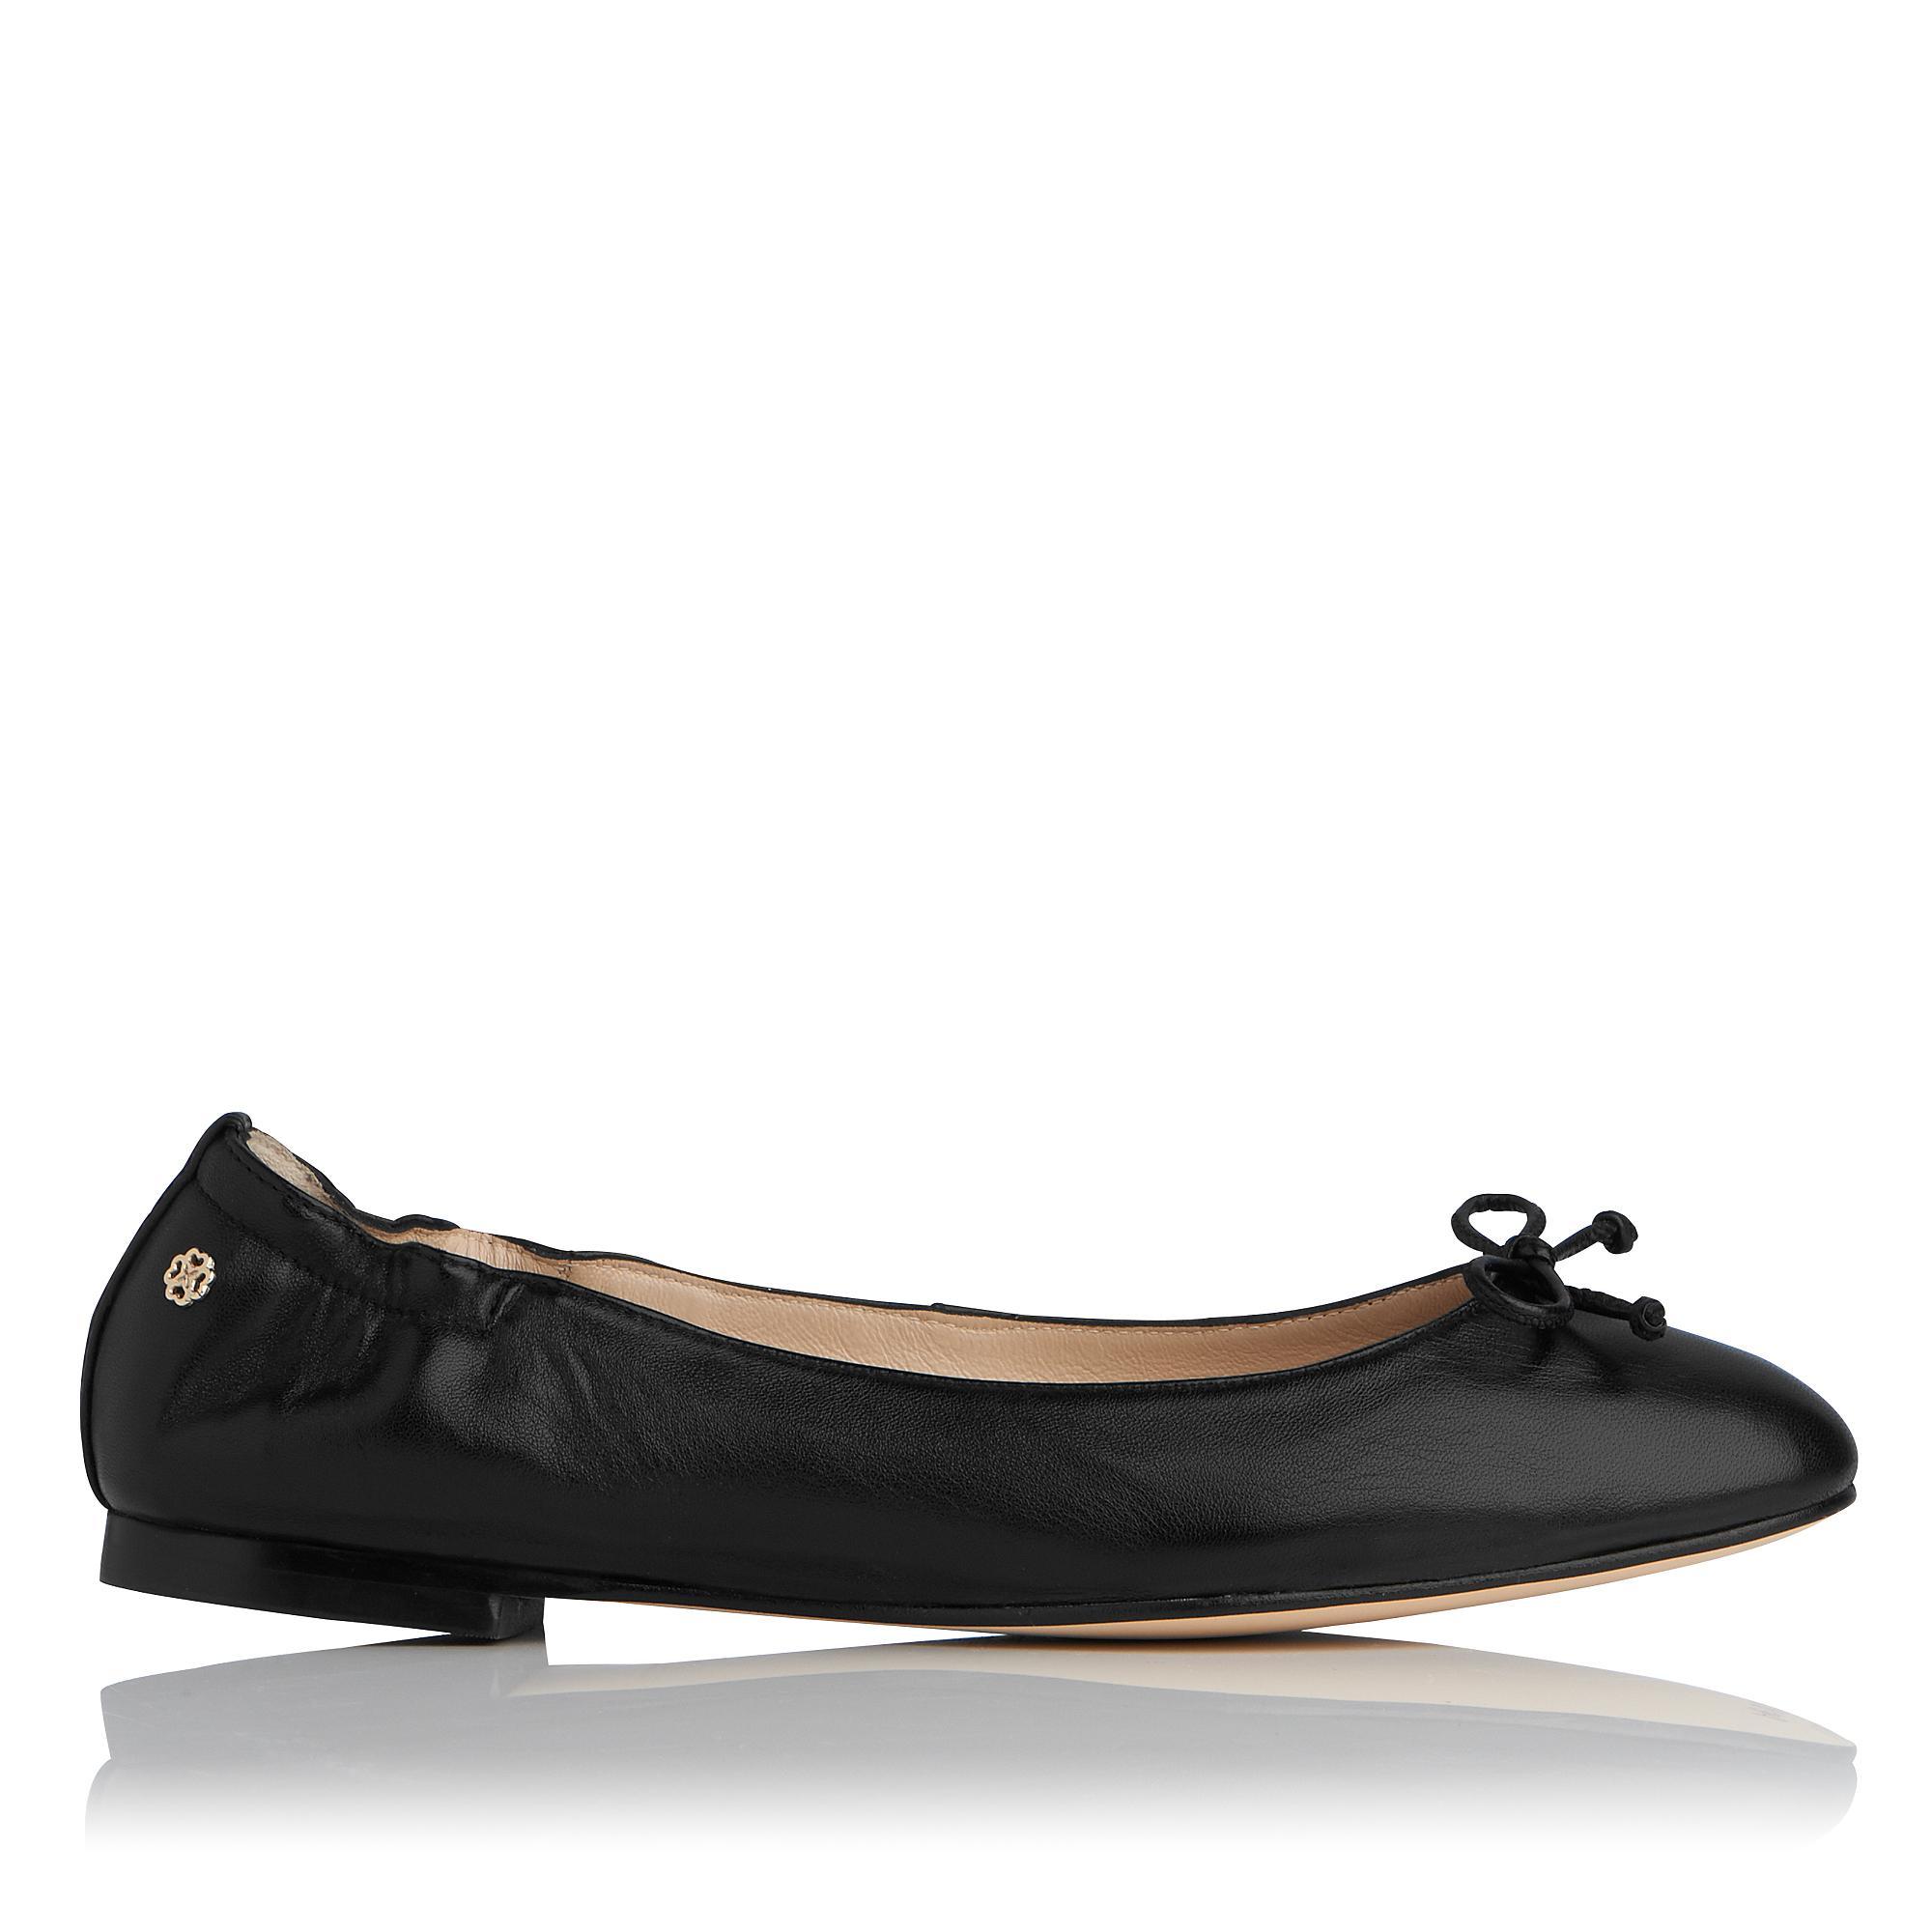 Thea Black Ballet Flat